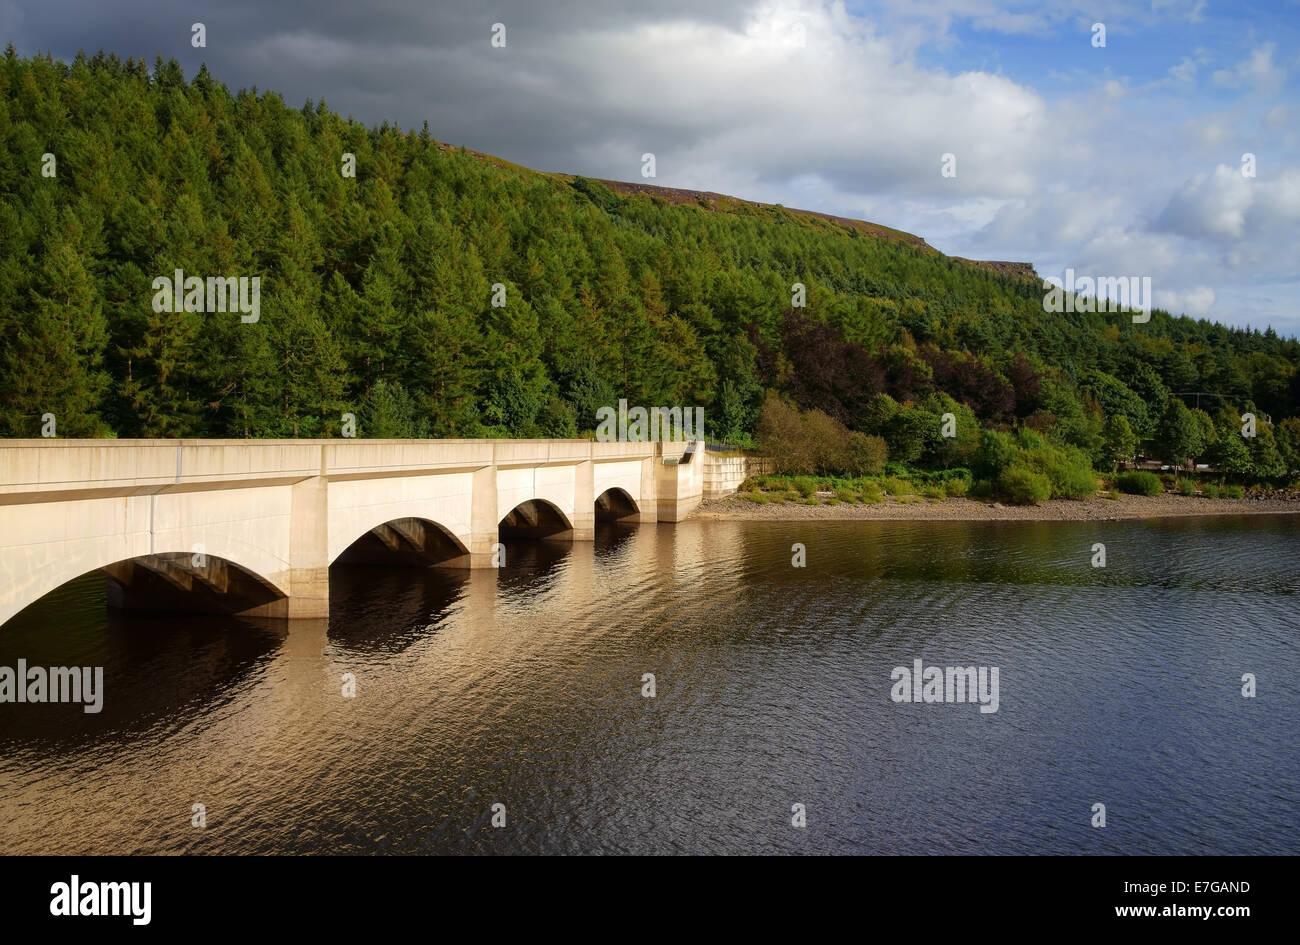 UK,Derbyshire,Peak District,Ladybower Reservoir looking towards Ladybower  Viaduct & Bamford Tor - Stock Image